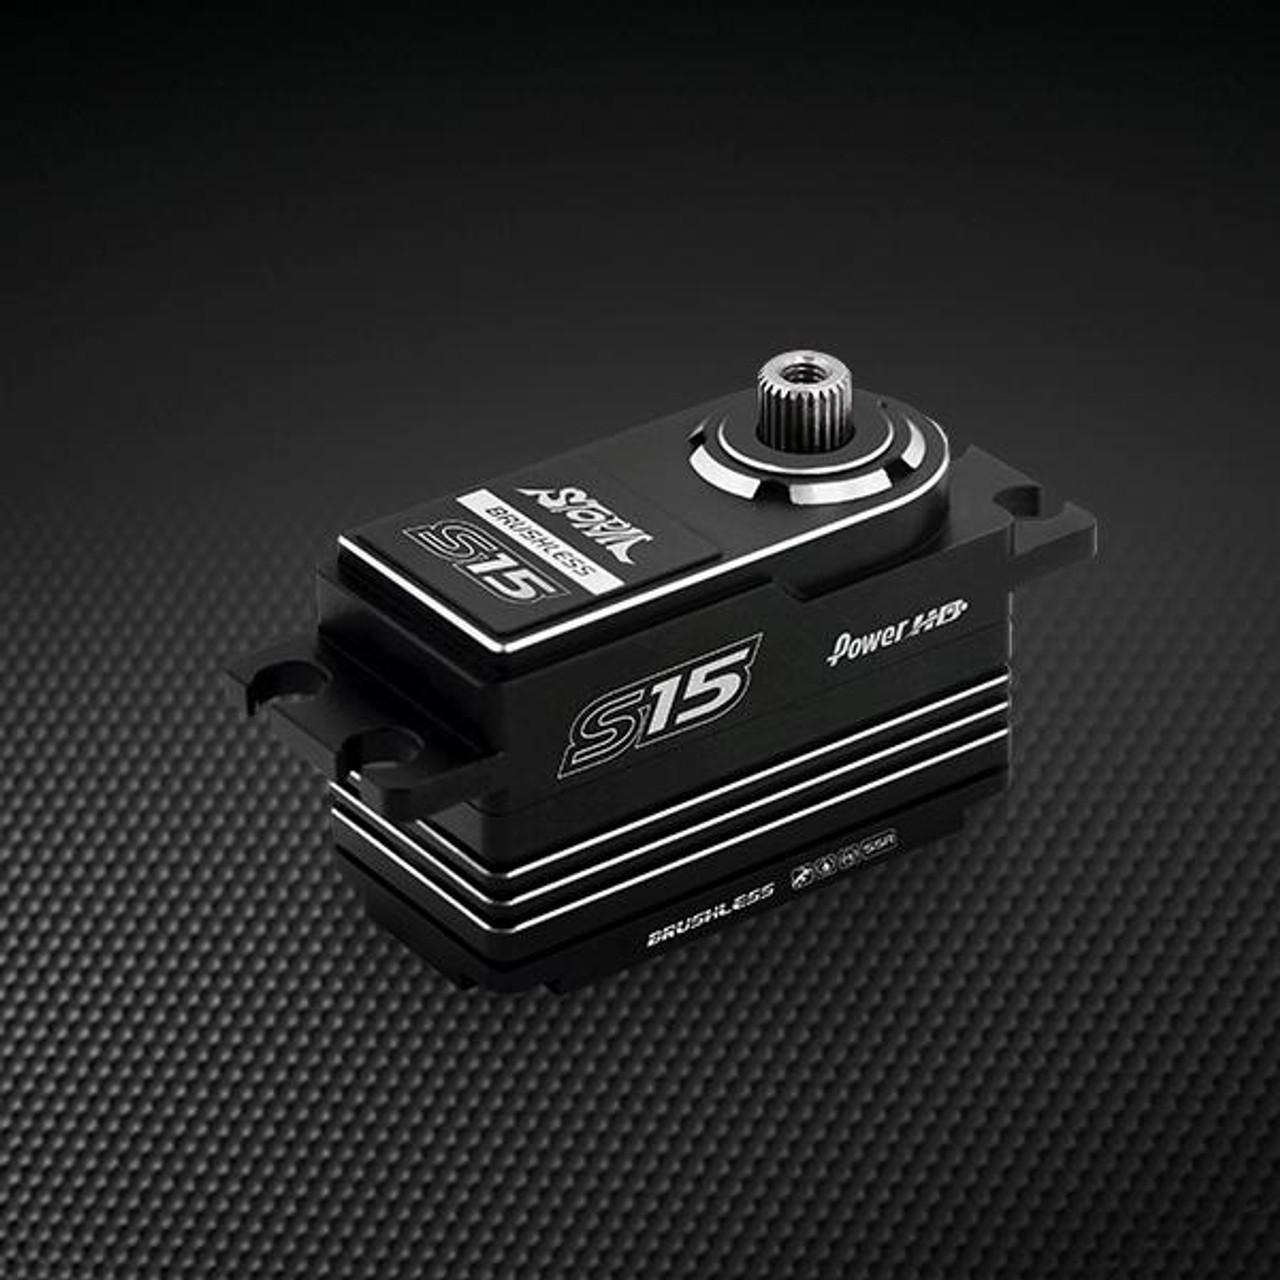 Power HD S15 Silver Low Profile (0.06s/15.0kg/7.4V) Brushless Servo